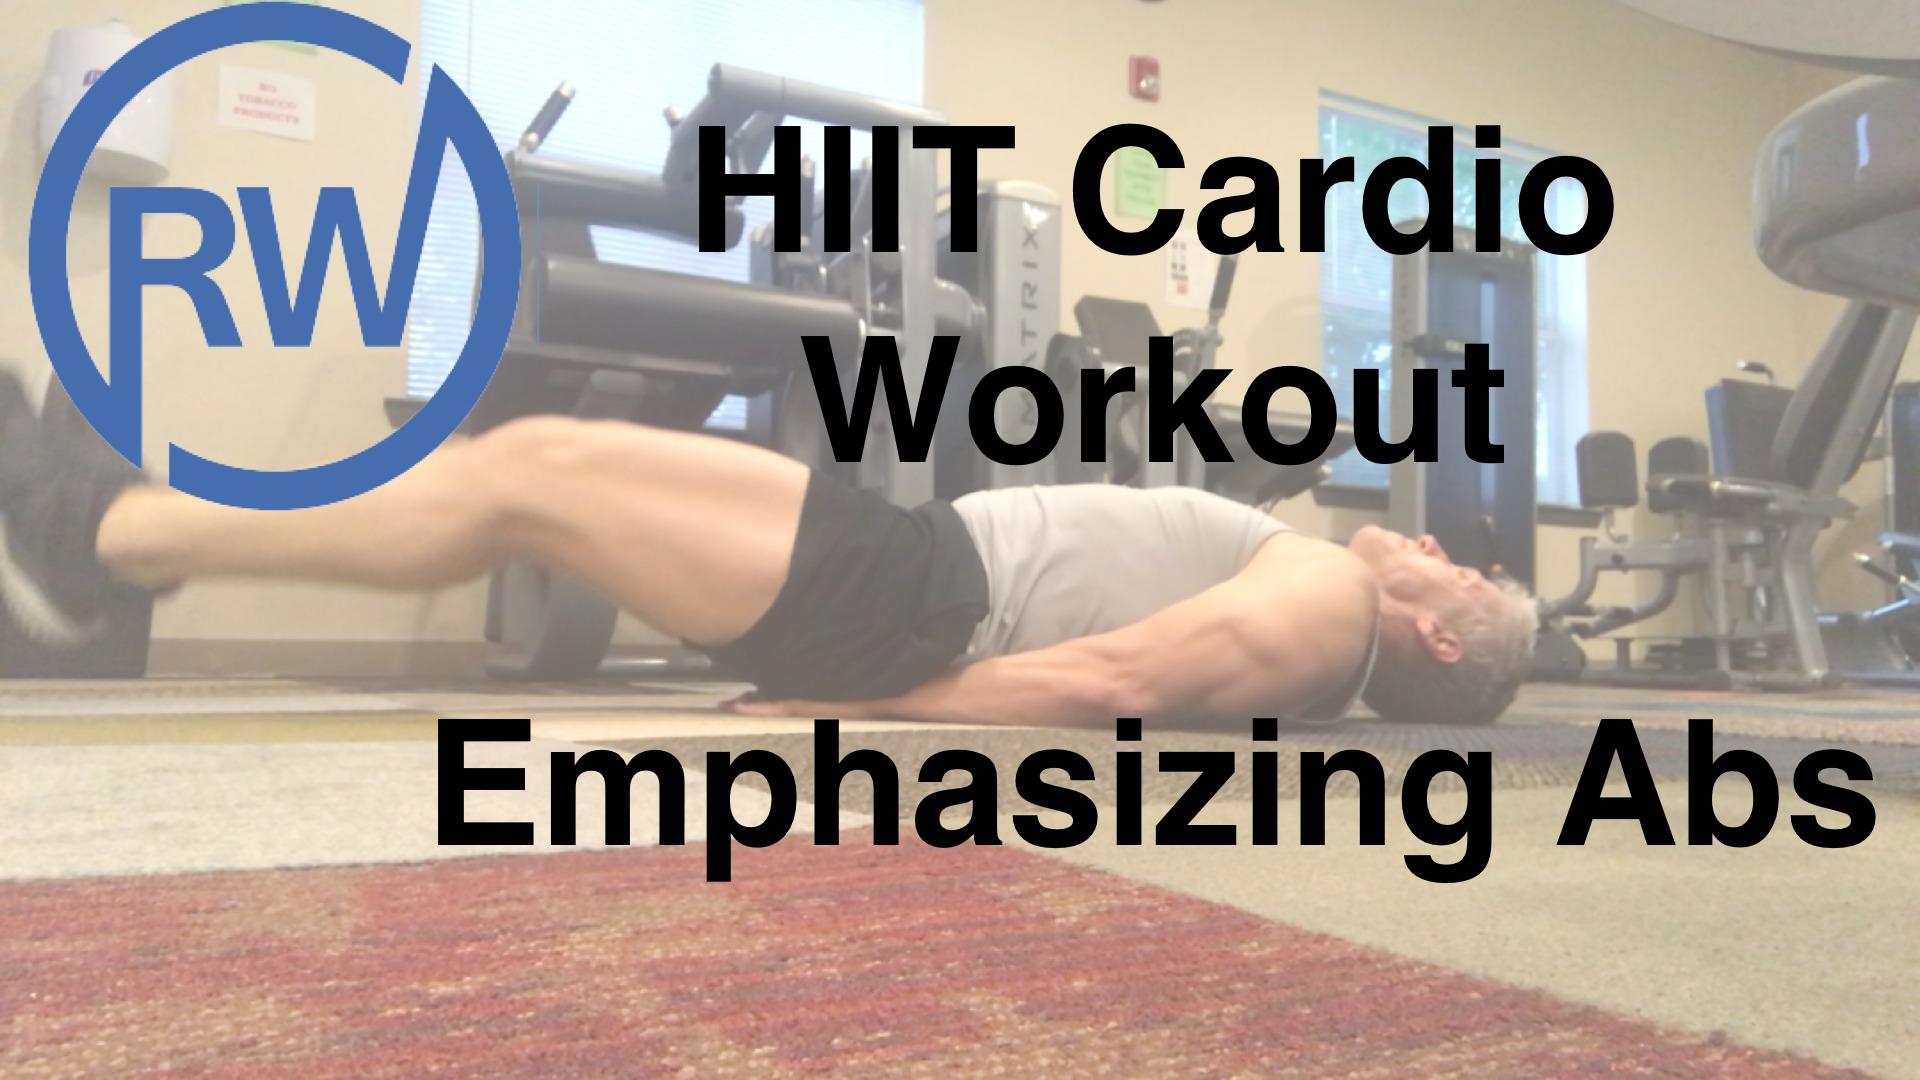 HIIT Cardio Work Emphasizing Abs